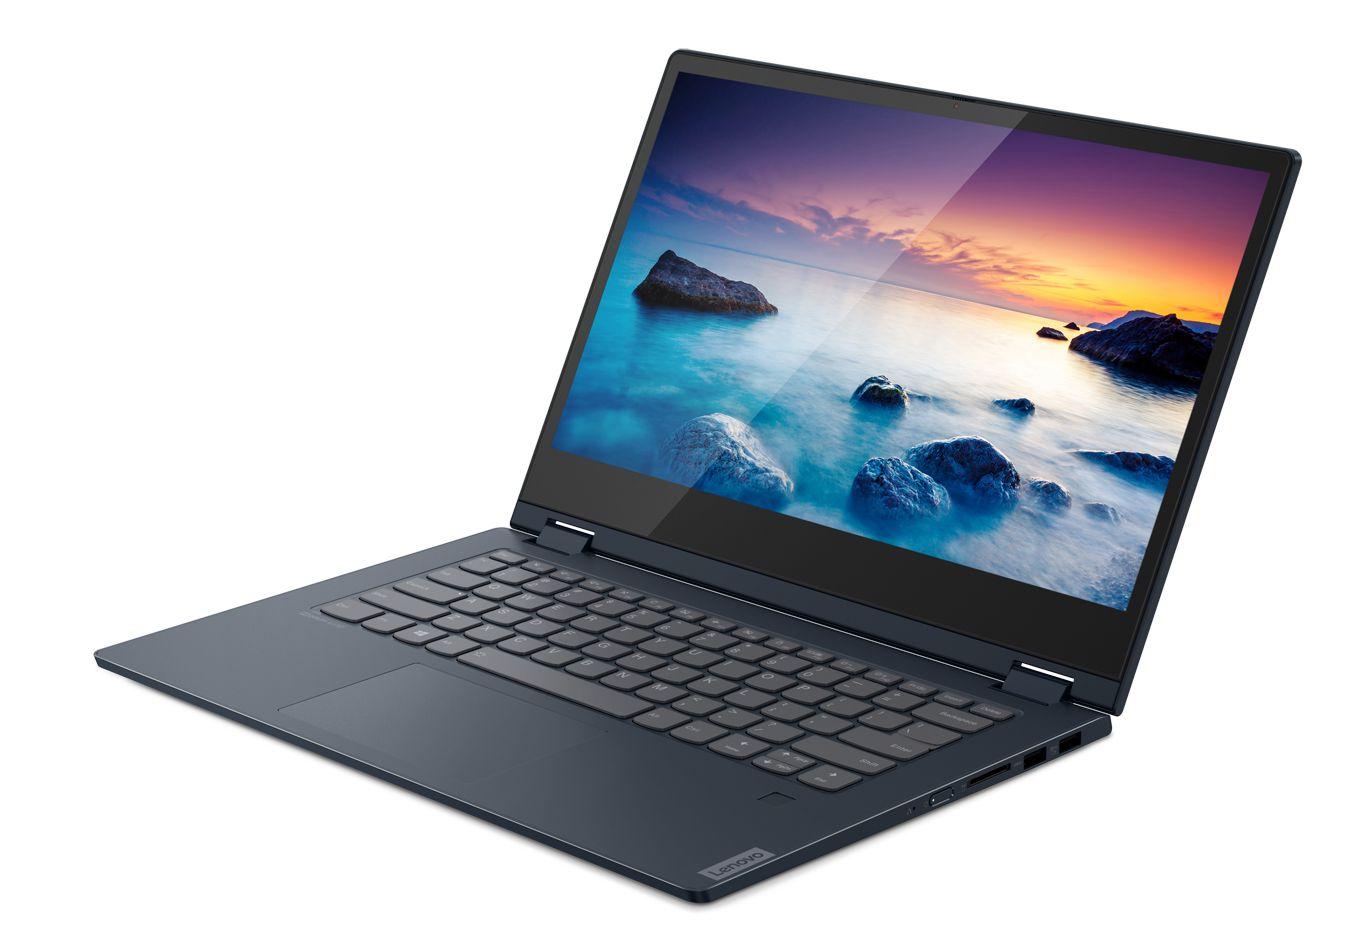 The Lenovo IdeaPad Flex 14